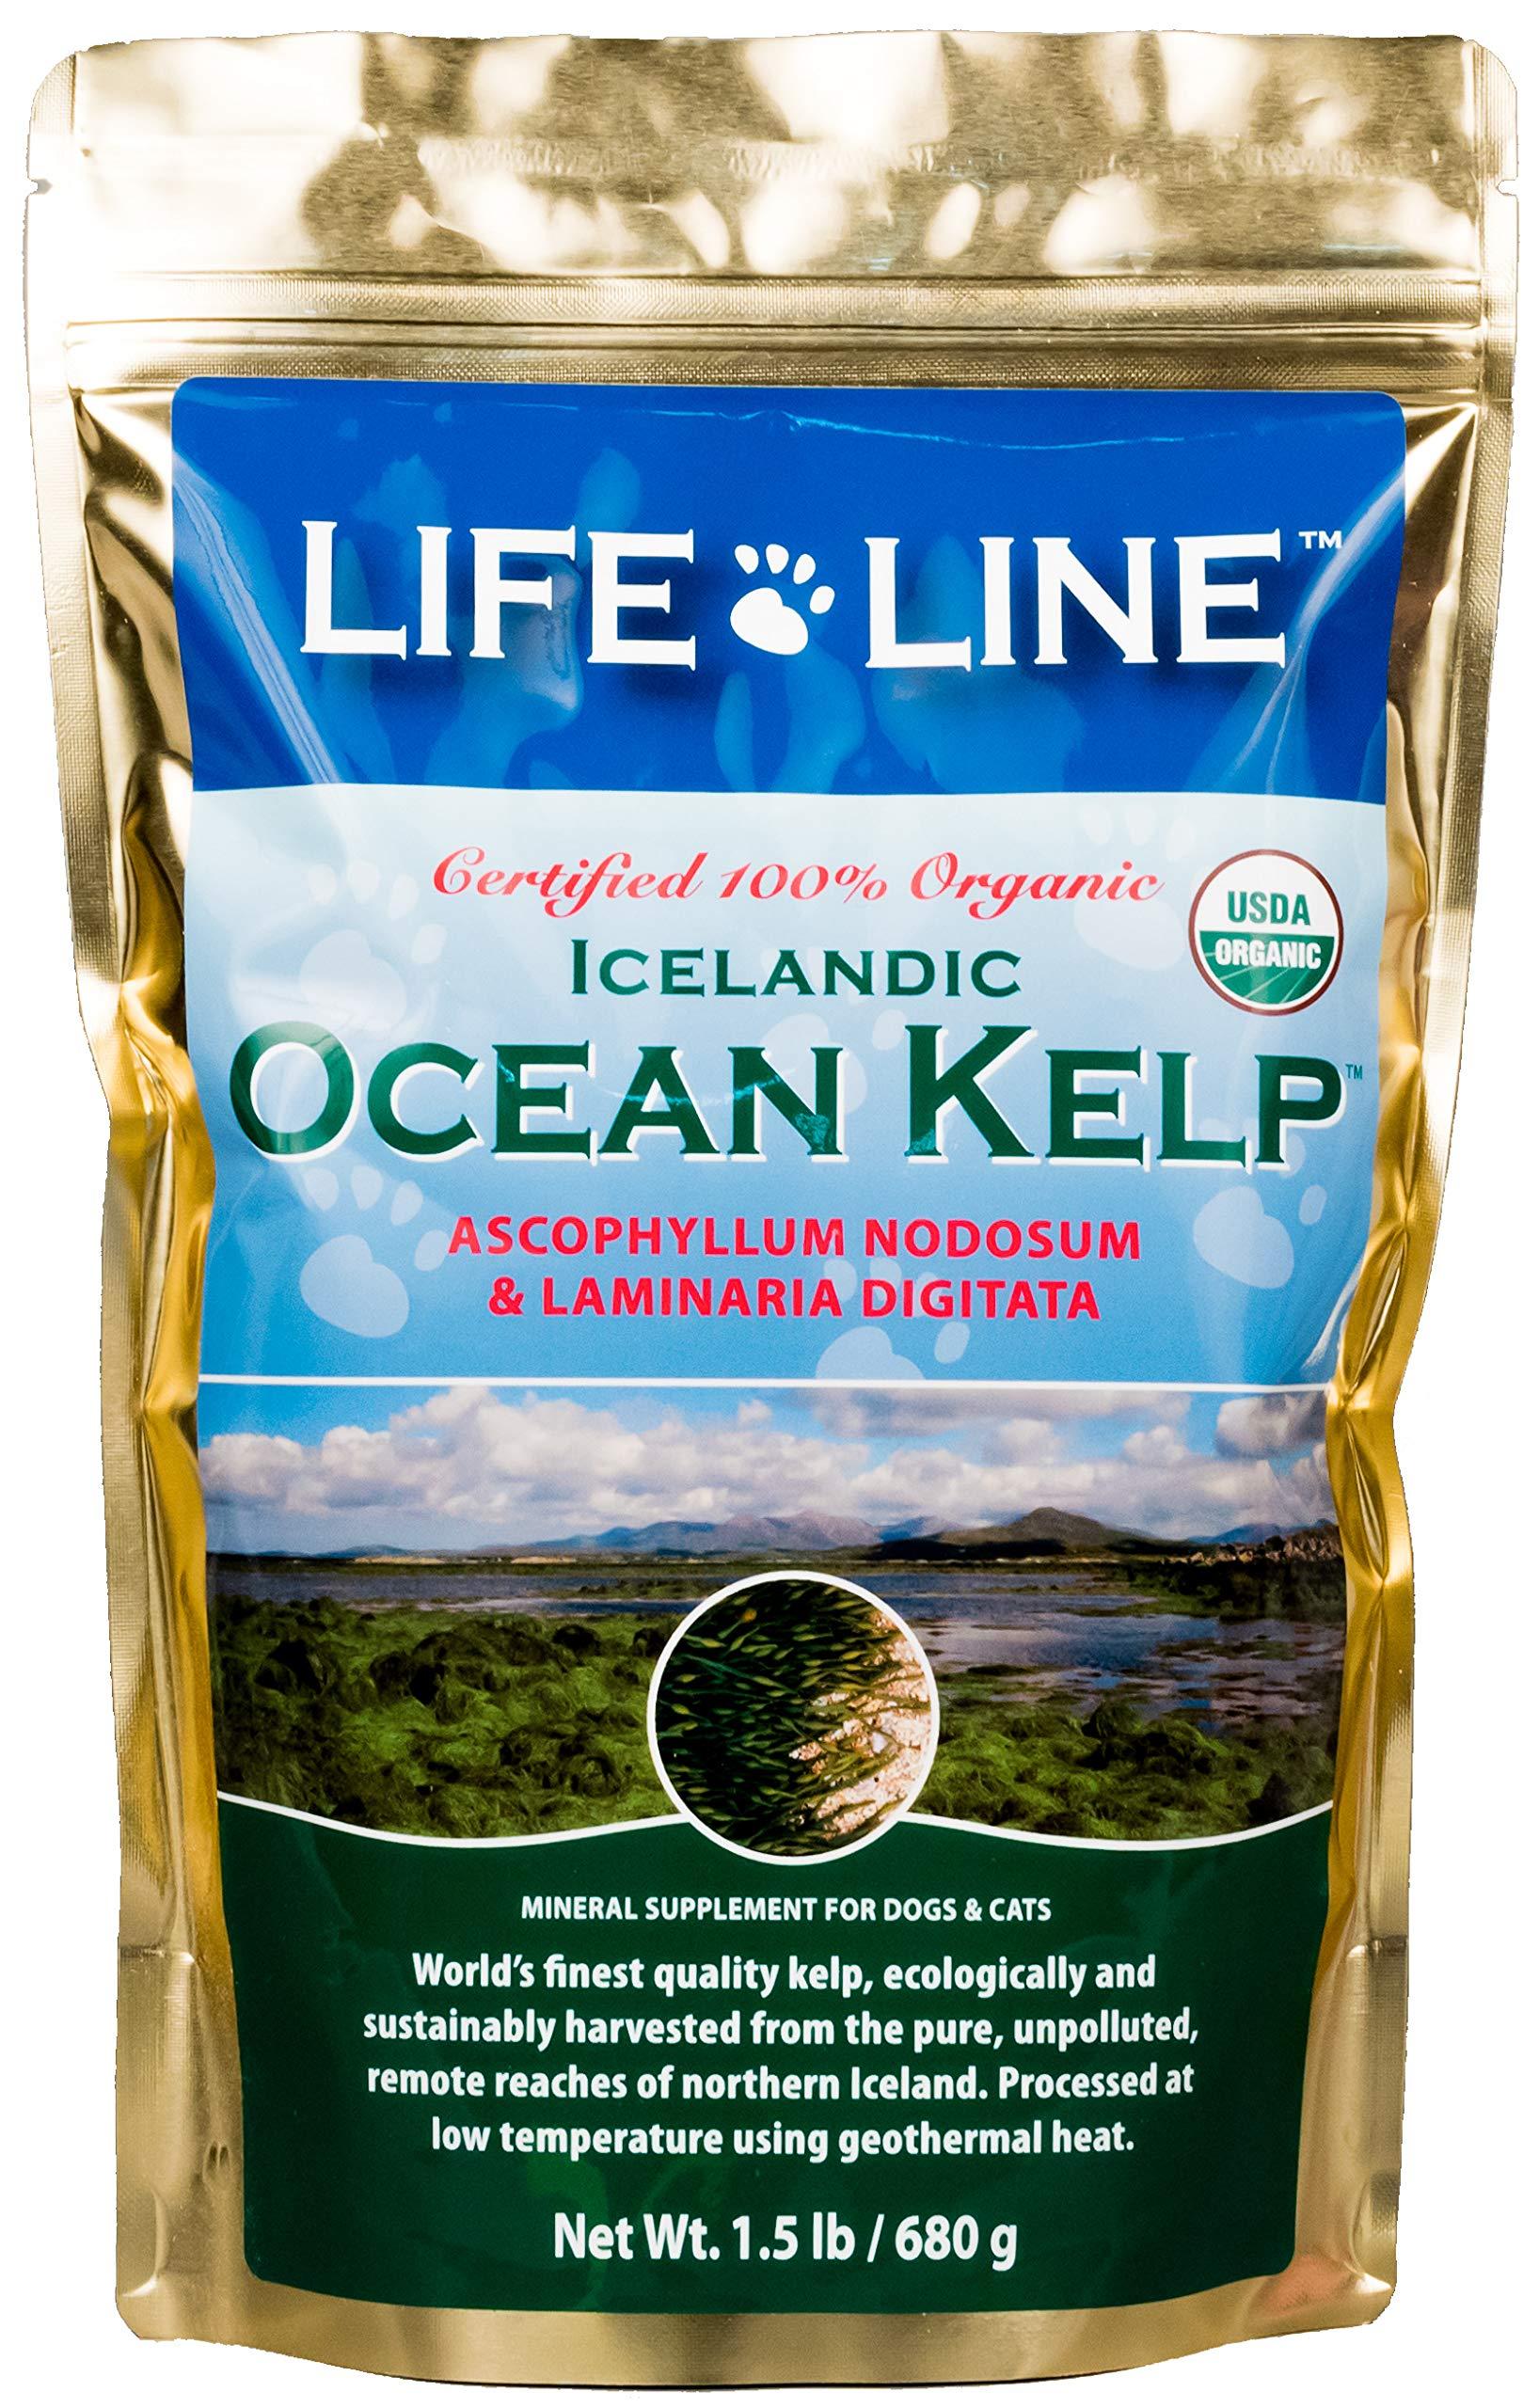 Life Line Pet Nutrition Organic Ocean Kelp Supplement for Skin & Coat, Digestion, Teeth & Gums in Dogs & Cats, 1-1/2-Pound by Life Line Pet Nutrition